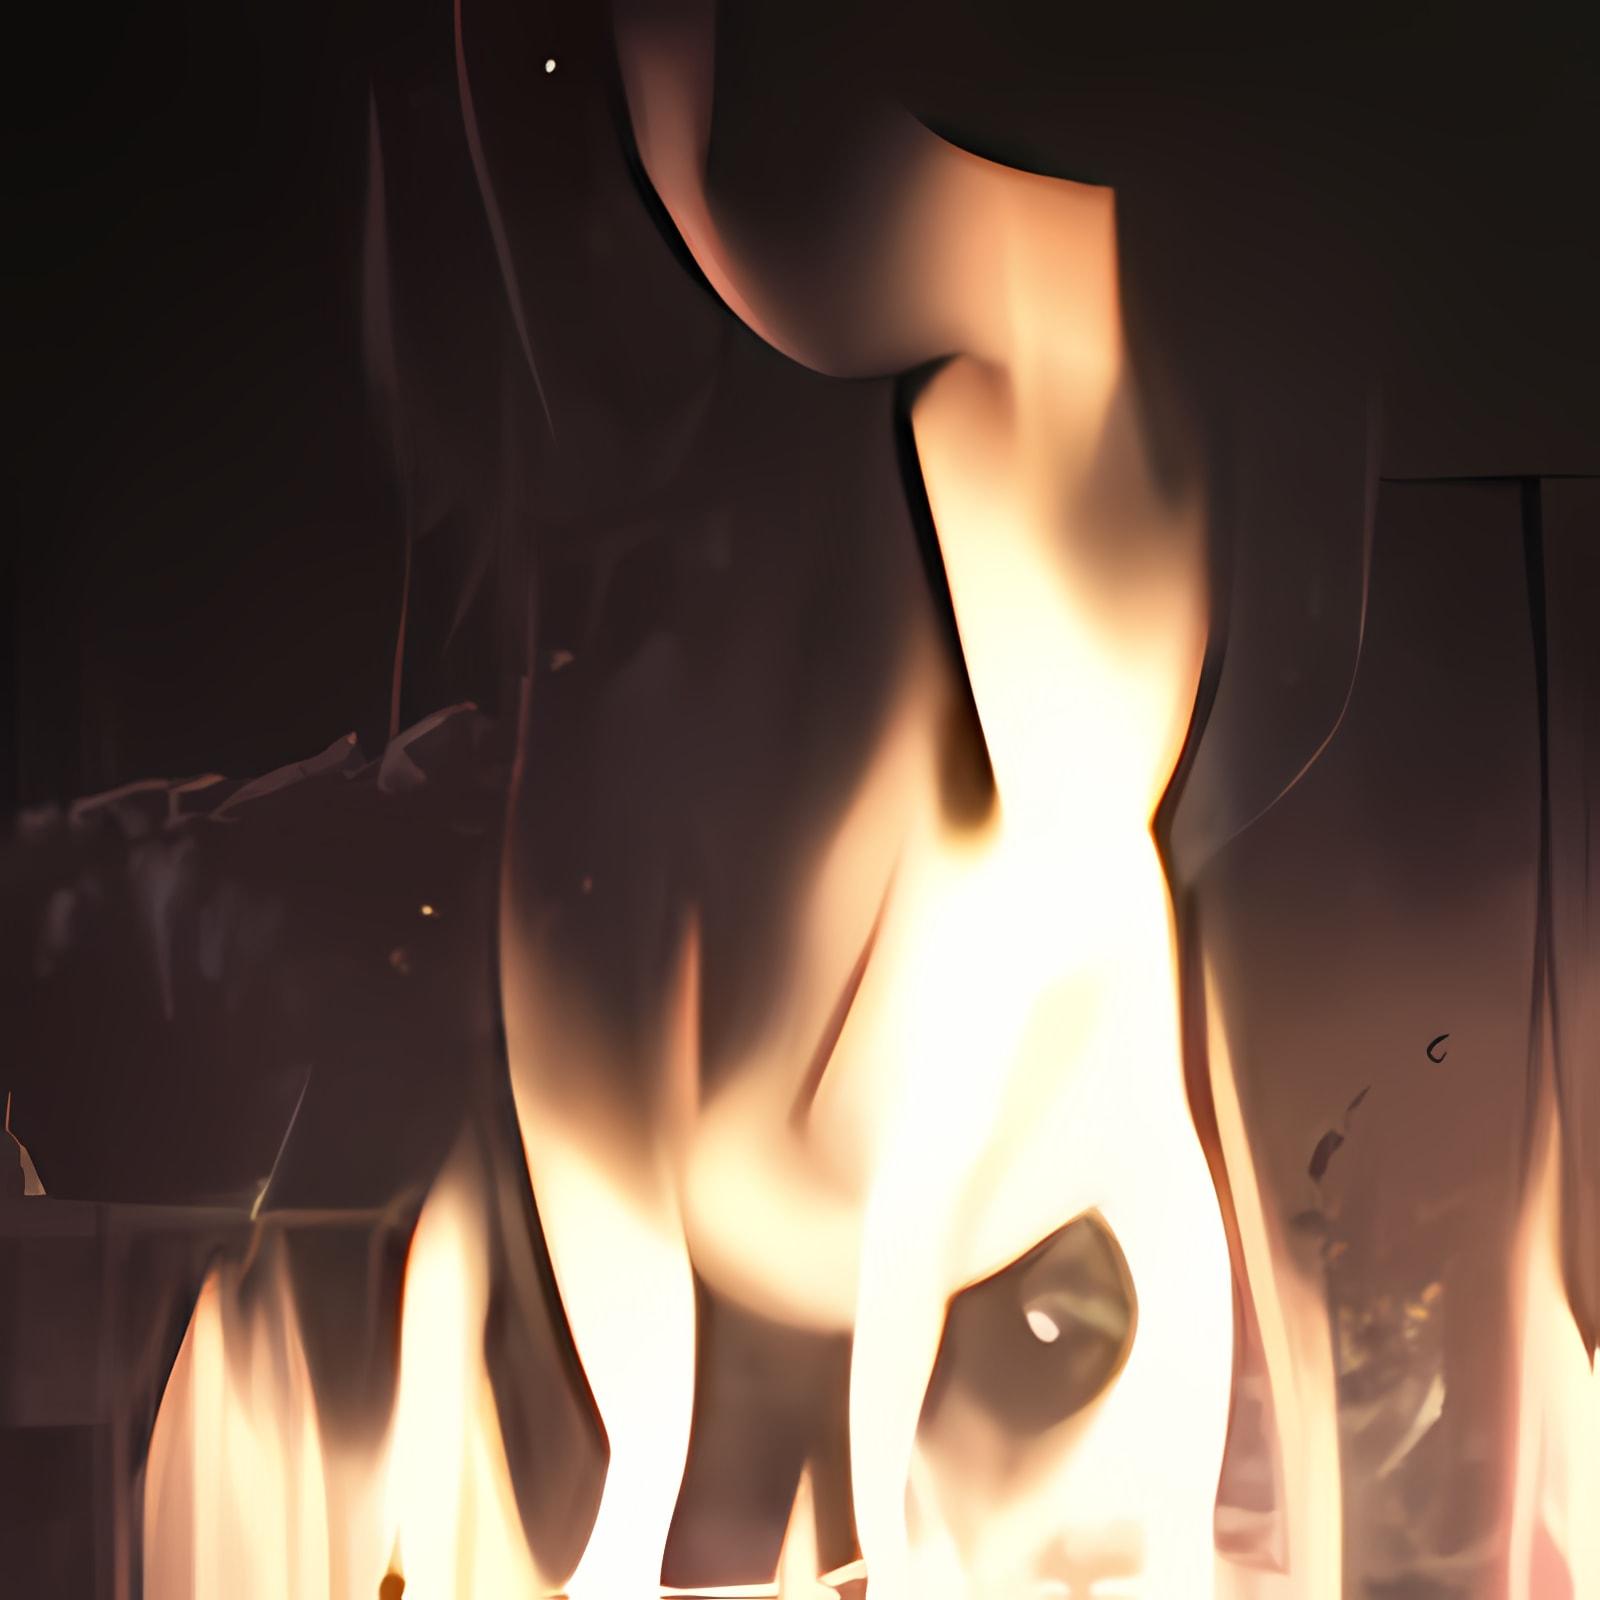 Fireplace 1.2